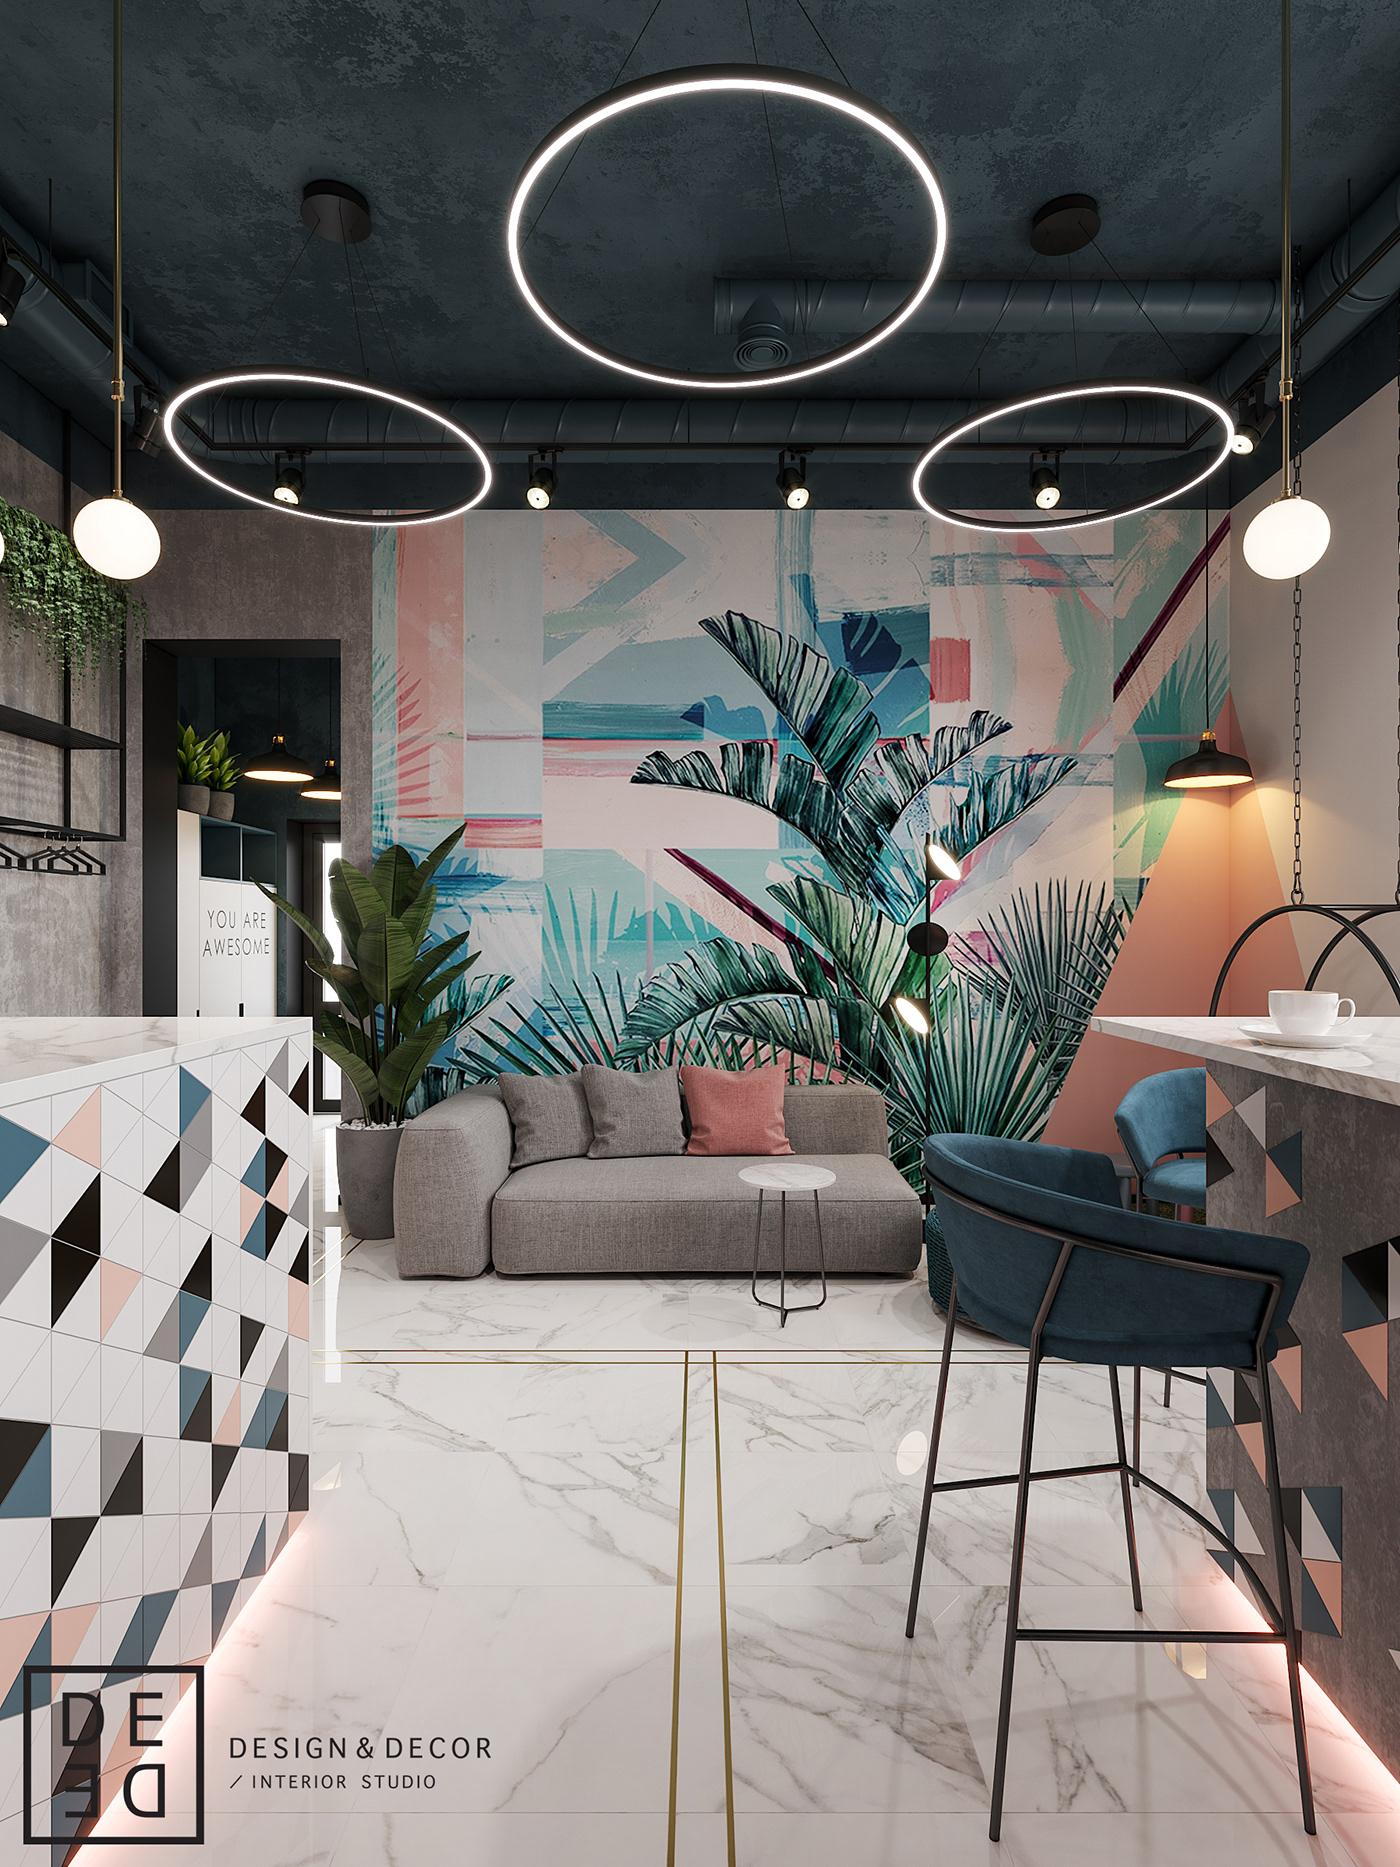 Interior design interiordesign Minimalism modern DE&DE Interior Studio interiordesigner corona render  3d max photoshop